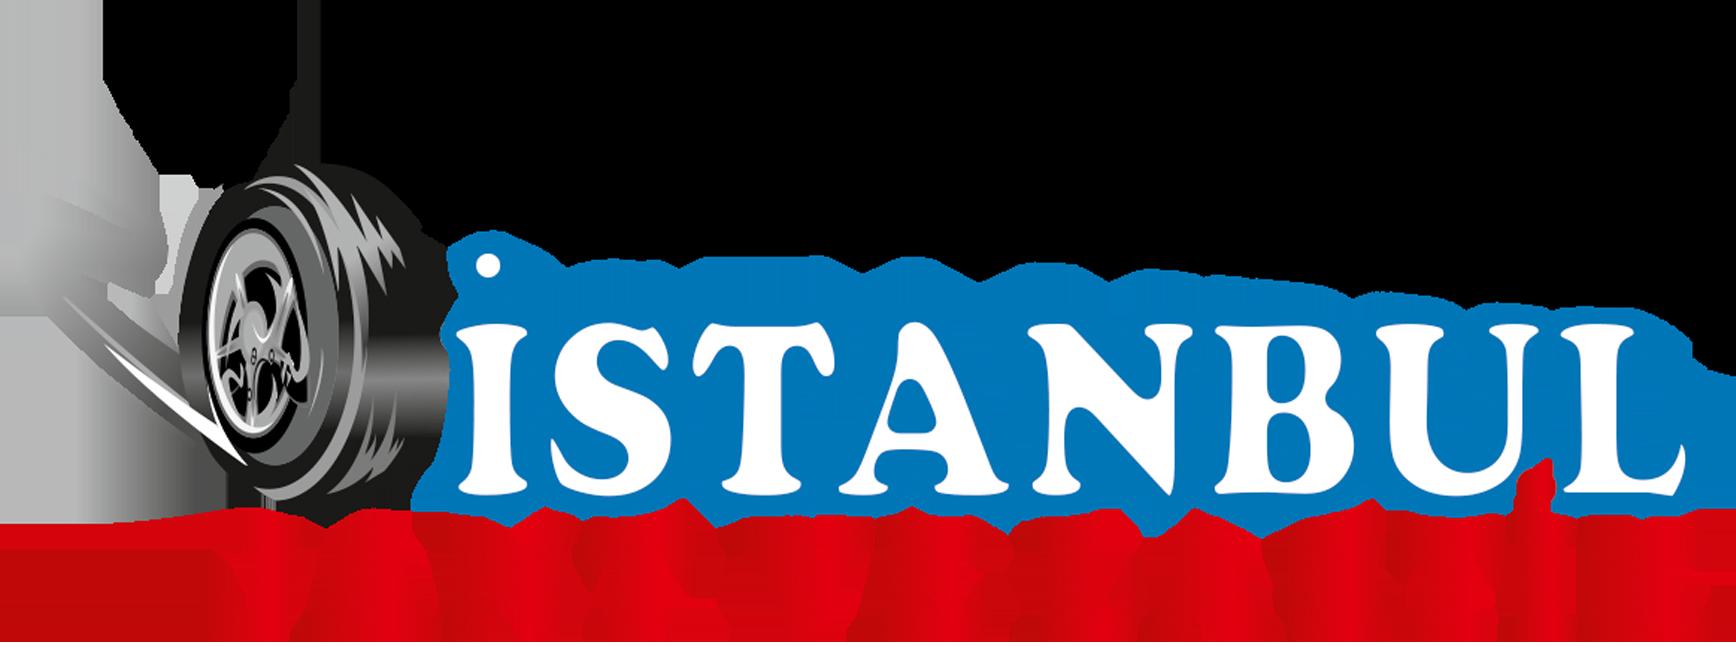 istanbul jant lastik - logo